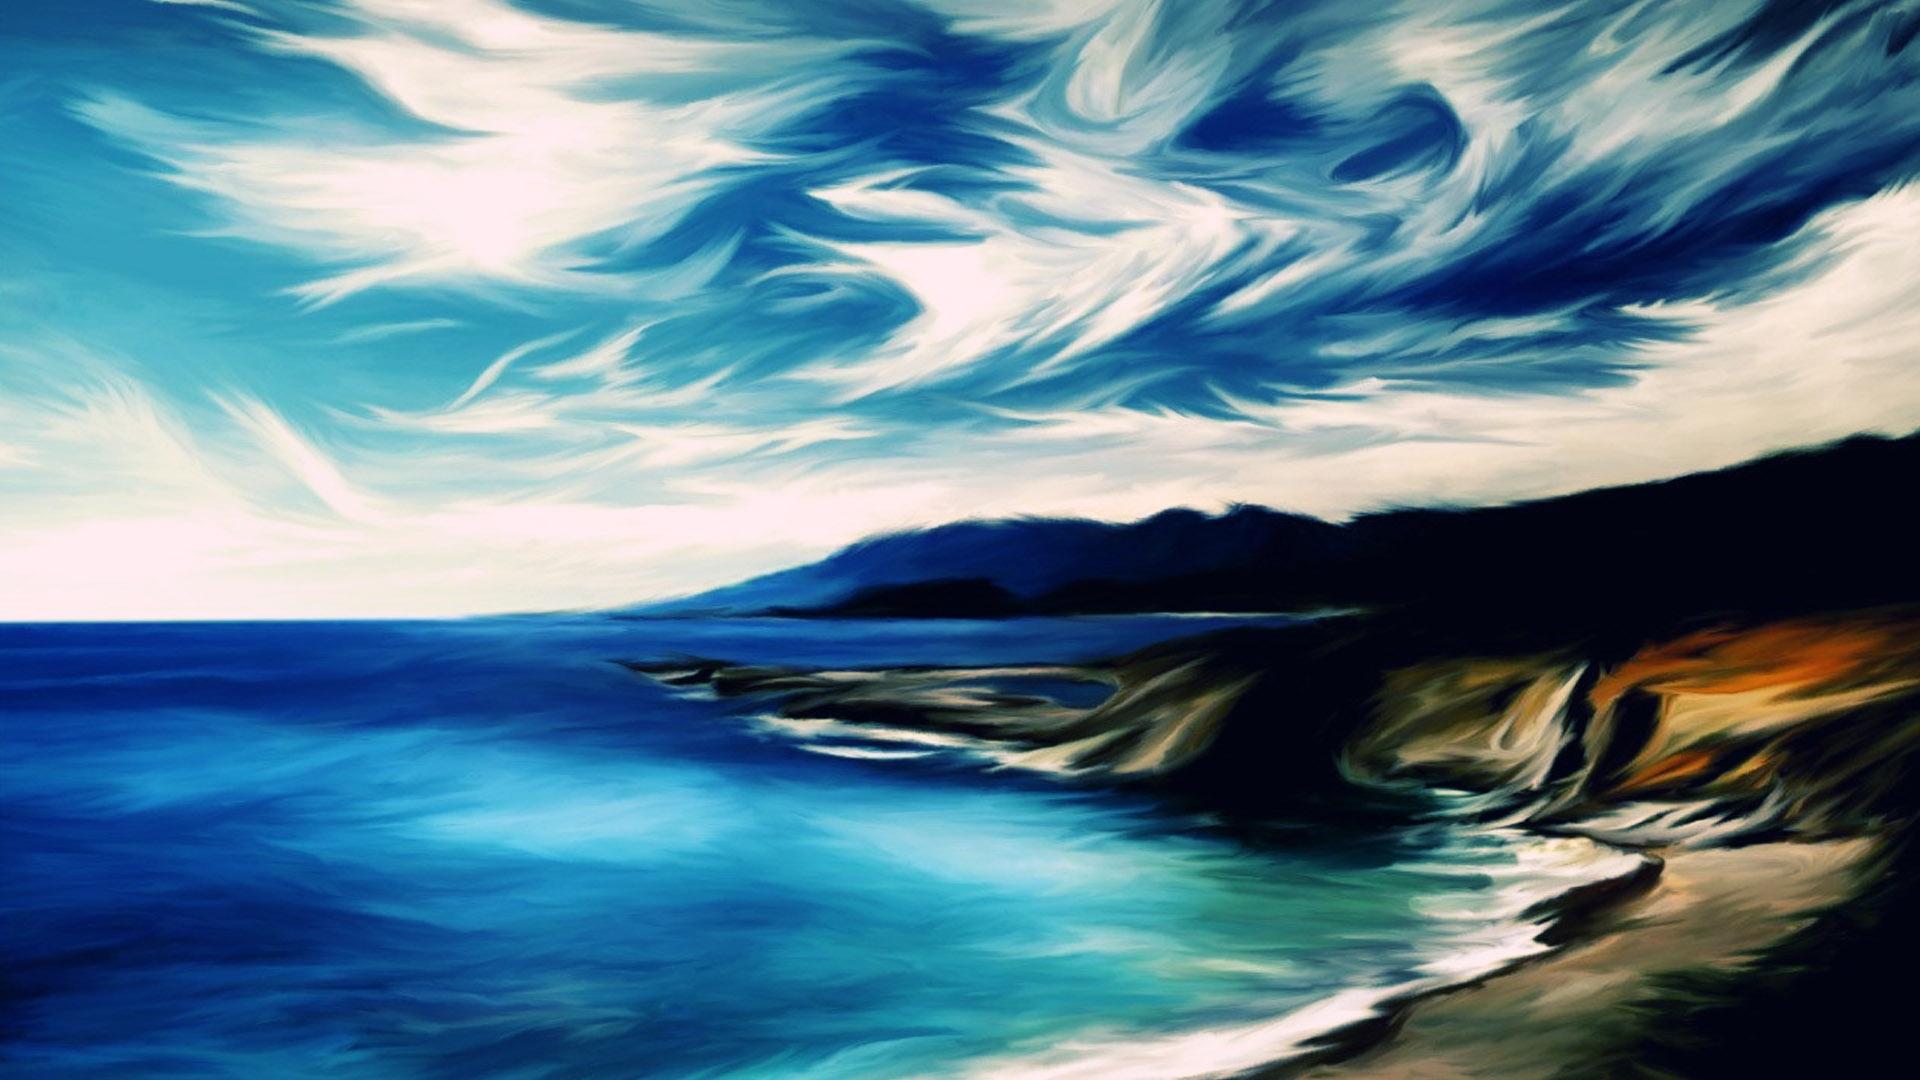 wallpaper painting desktop - photo #35